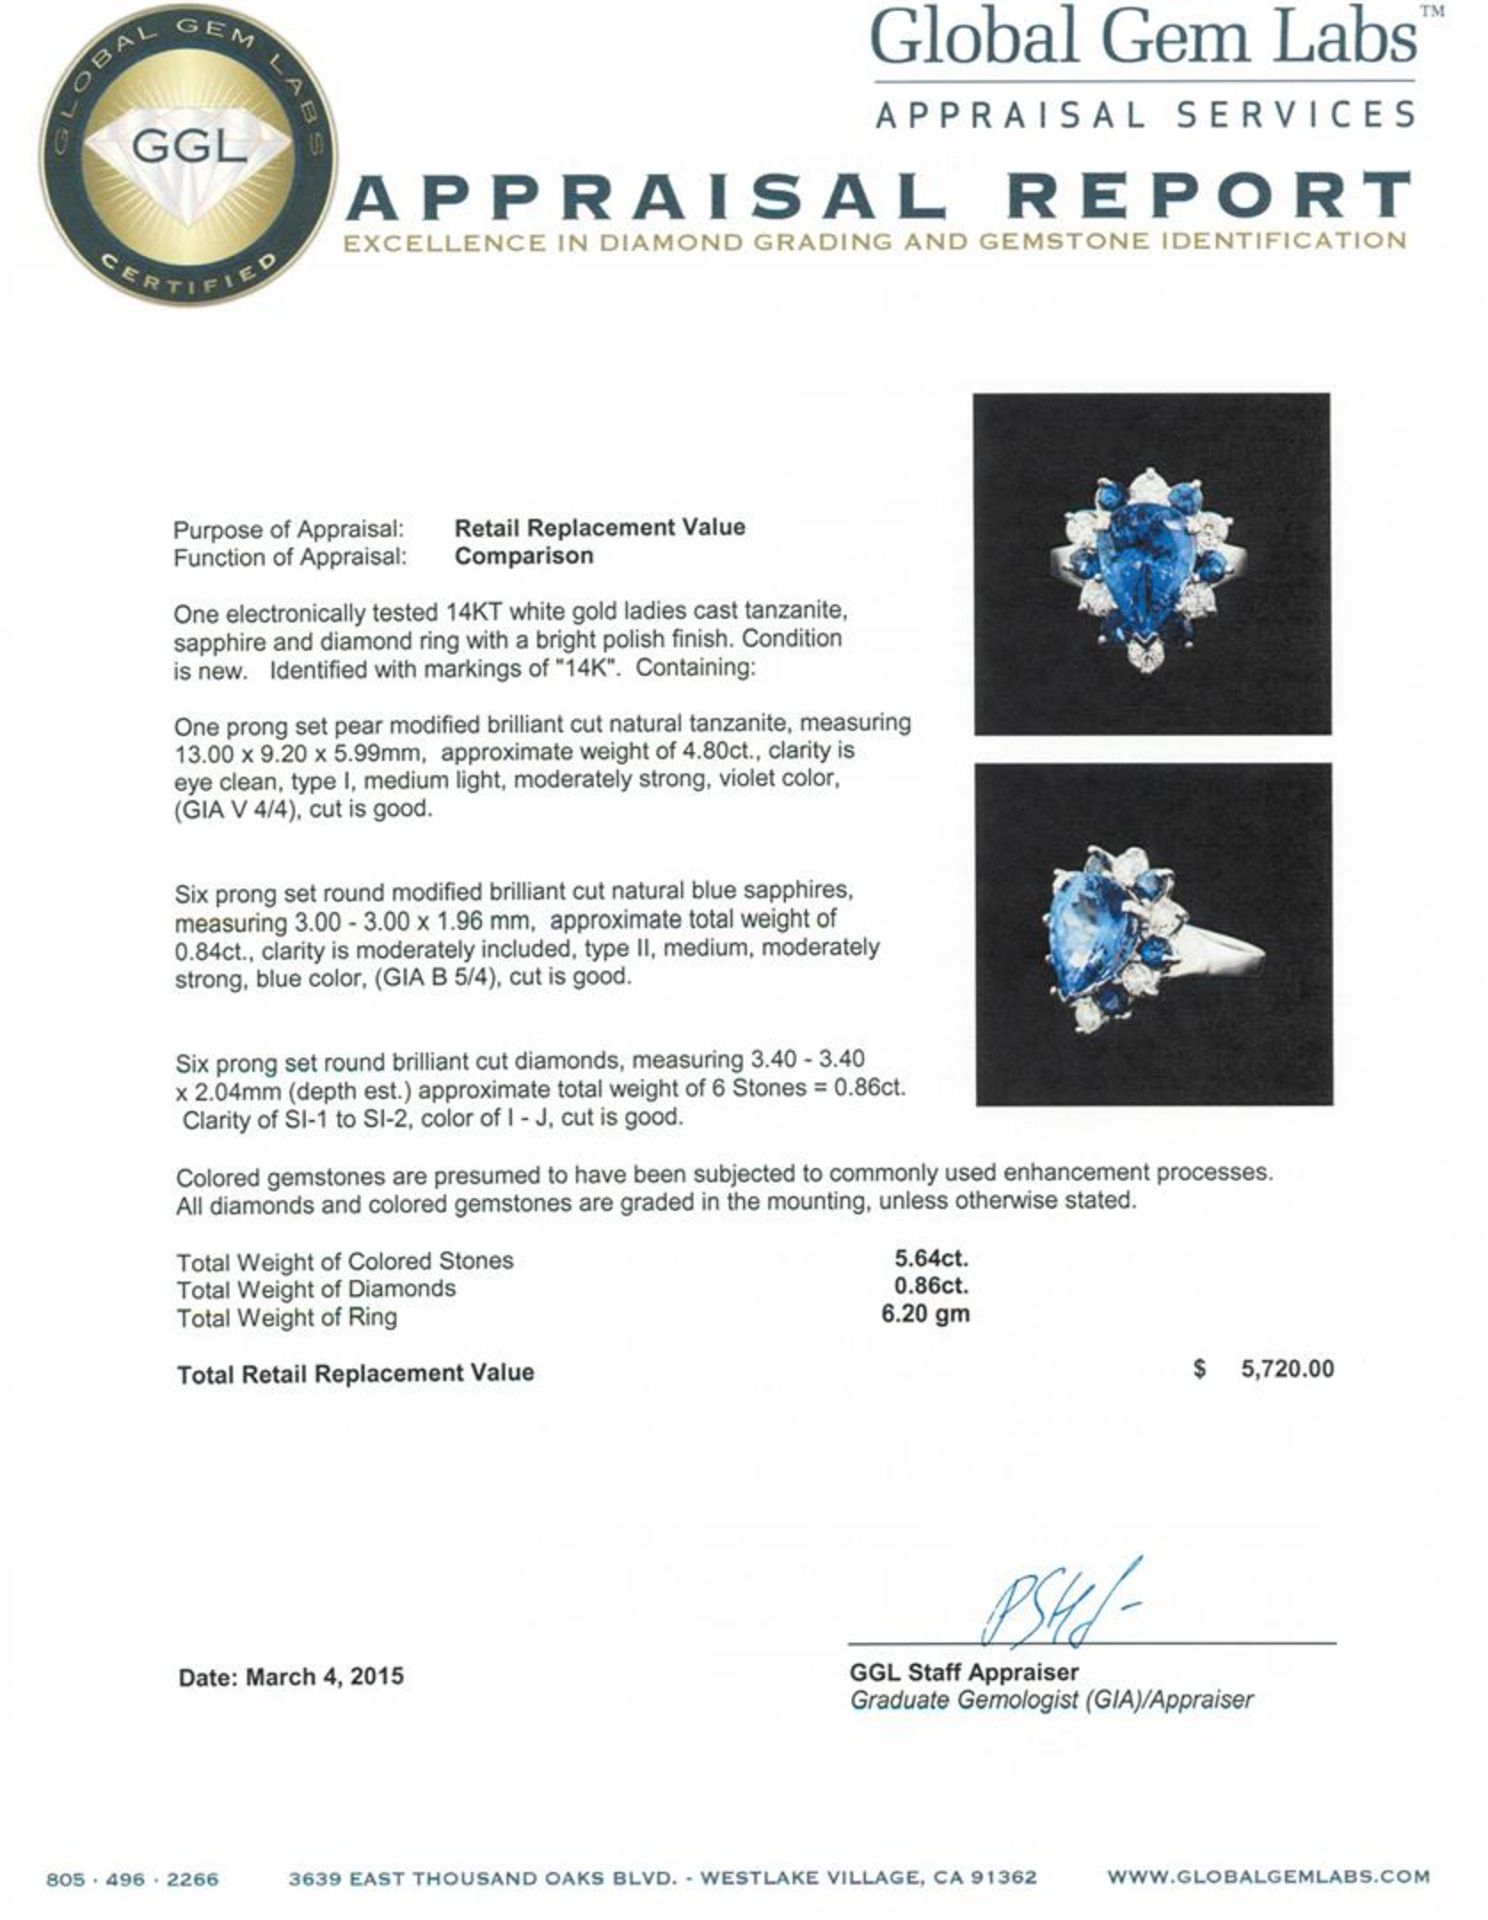 14KT White Gold 4.80 ctw Tanzanite, Sapphire and Diamond Ring - Image 4 of 4